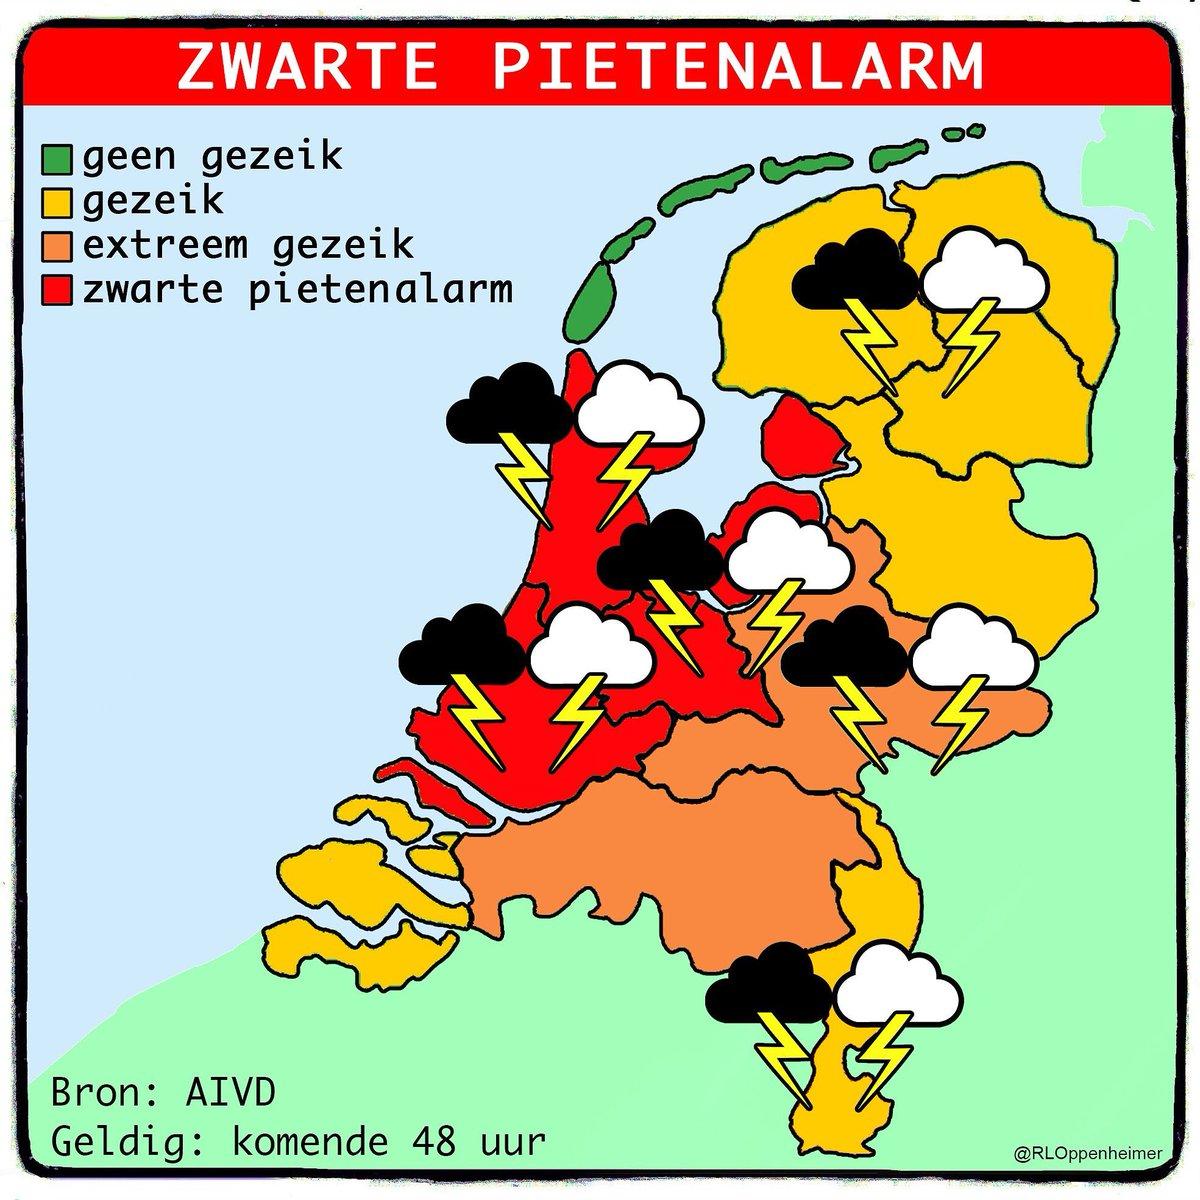 Zwartepietenalarm #Sinterklaas #intocht #Sinterklaasintocht #Sinterklaasjournaal #IntochtSinterklaas #ZwartePiet https://t.co/M1ViLSWlOK